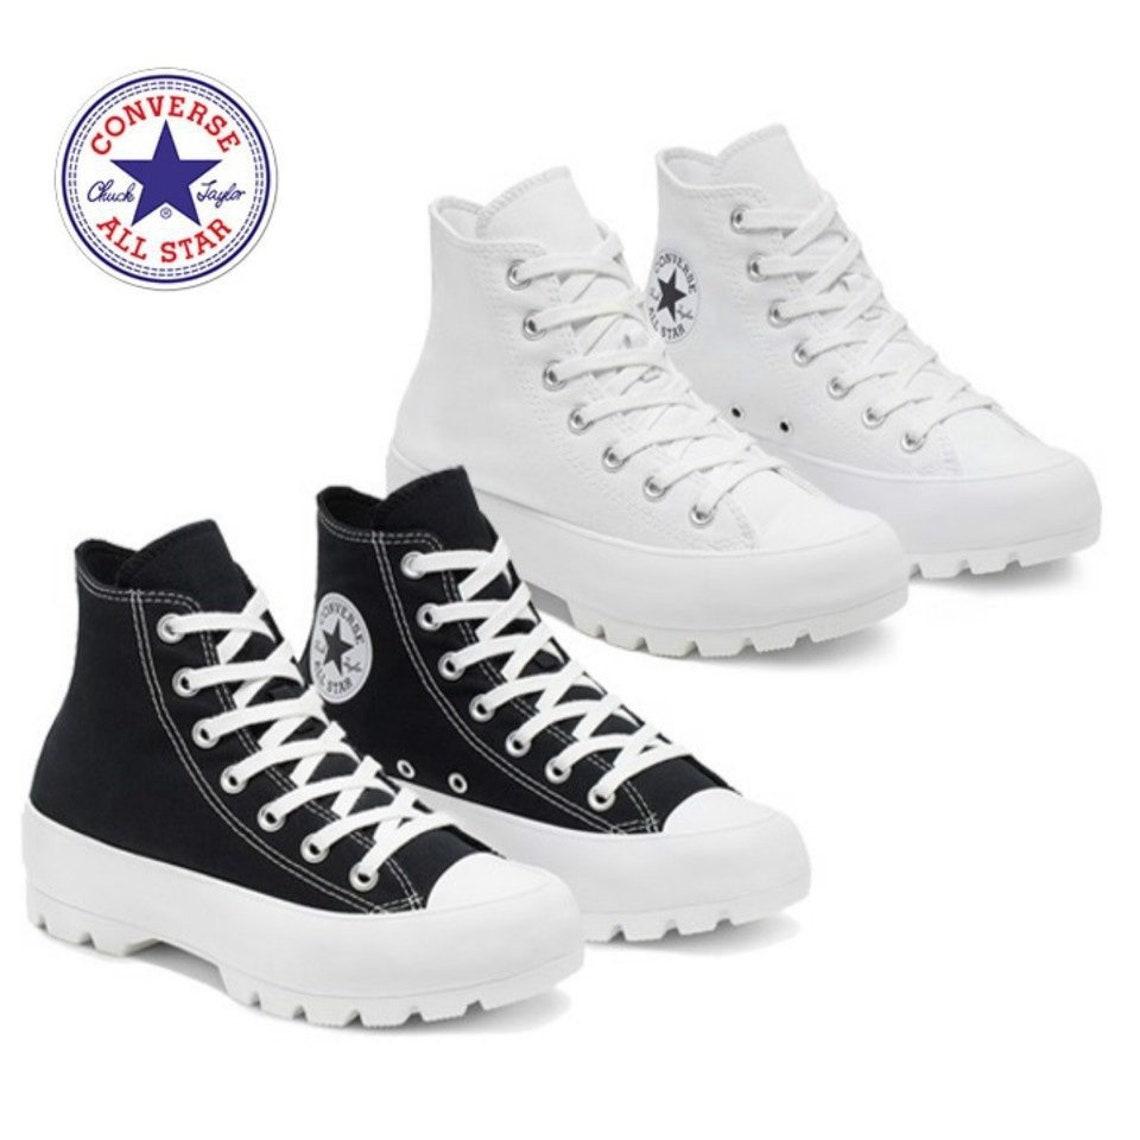 Plataforma negra Converse Canvas Wedge High Top Lugged Boot Kicks Custom w/ Swarovski Crystal Rhinestone Chuck Taylor All Star Sneakers Zapatos